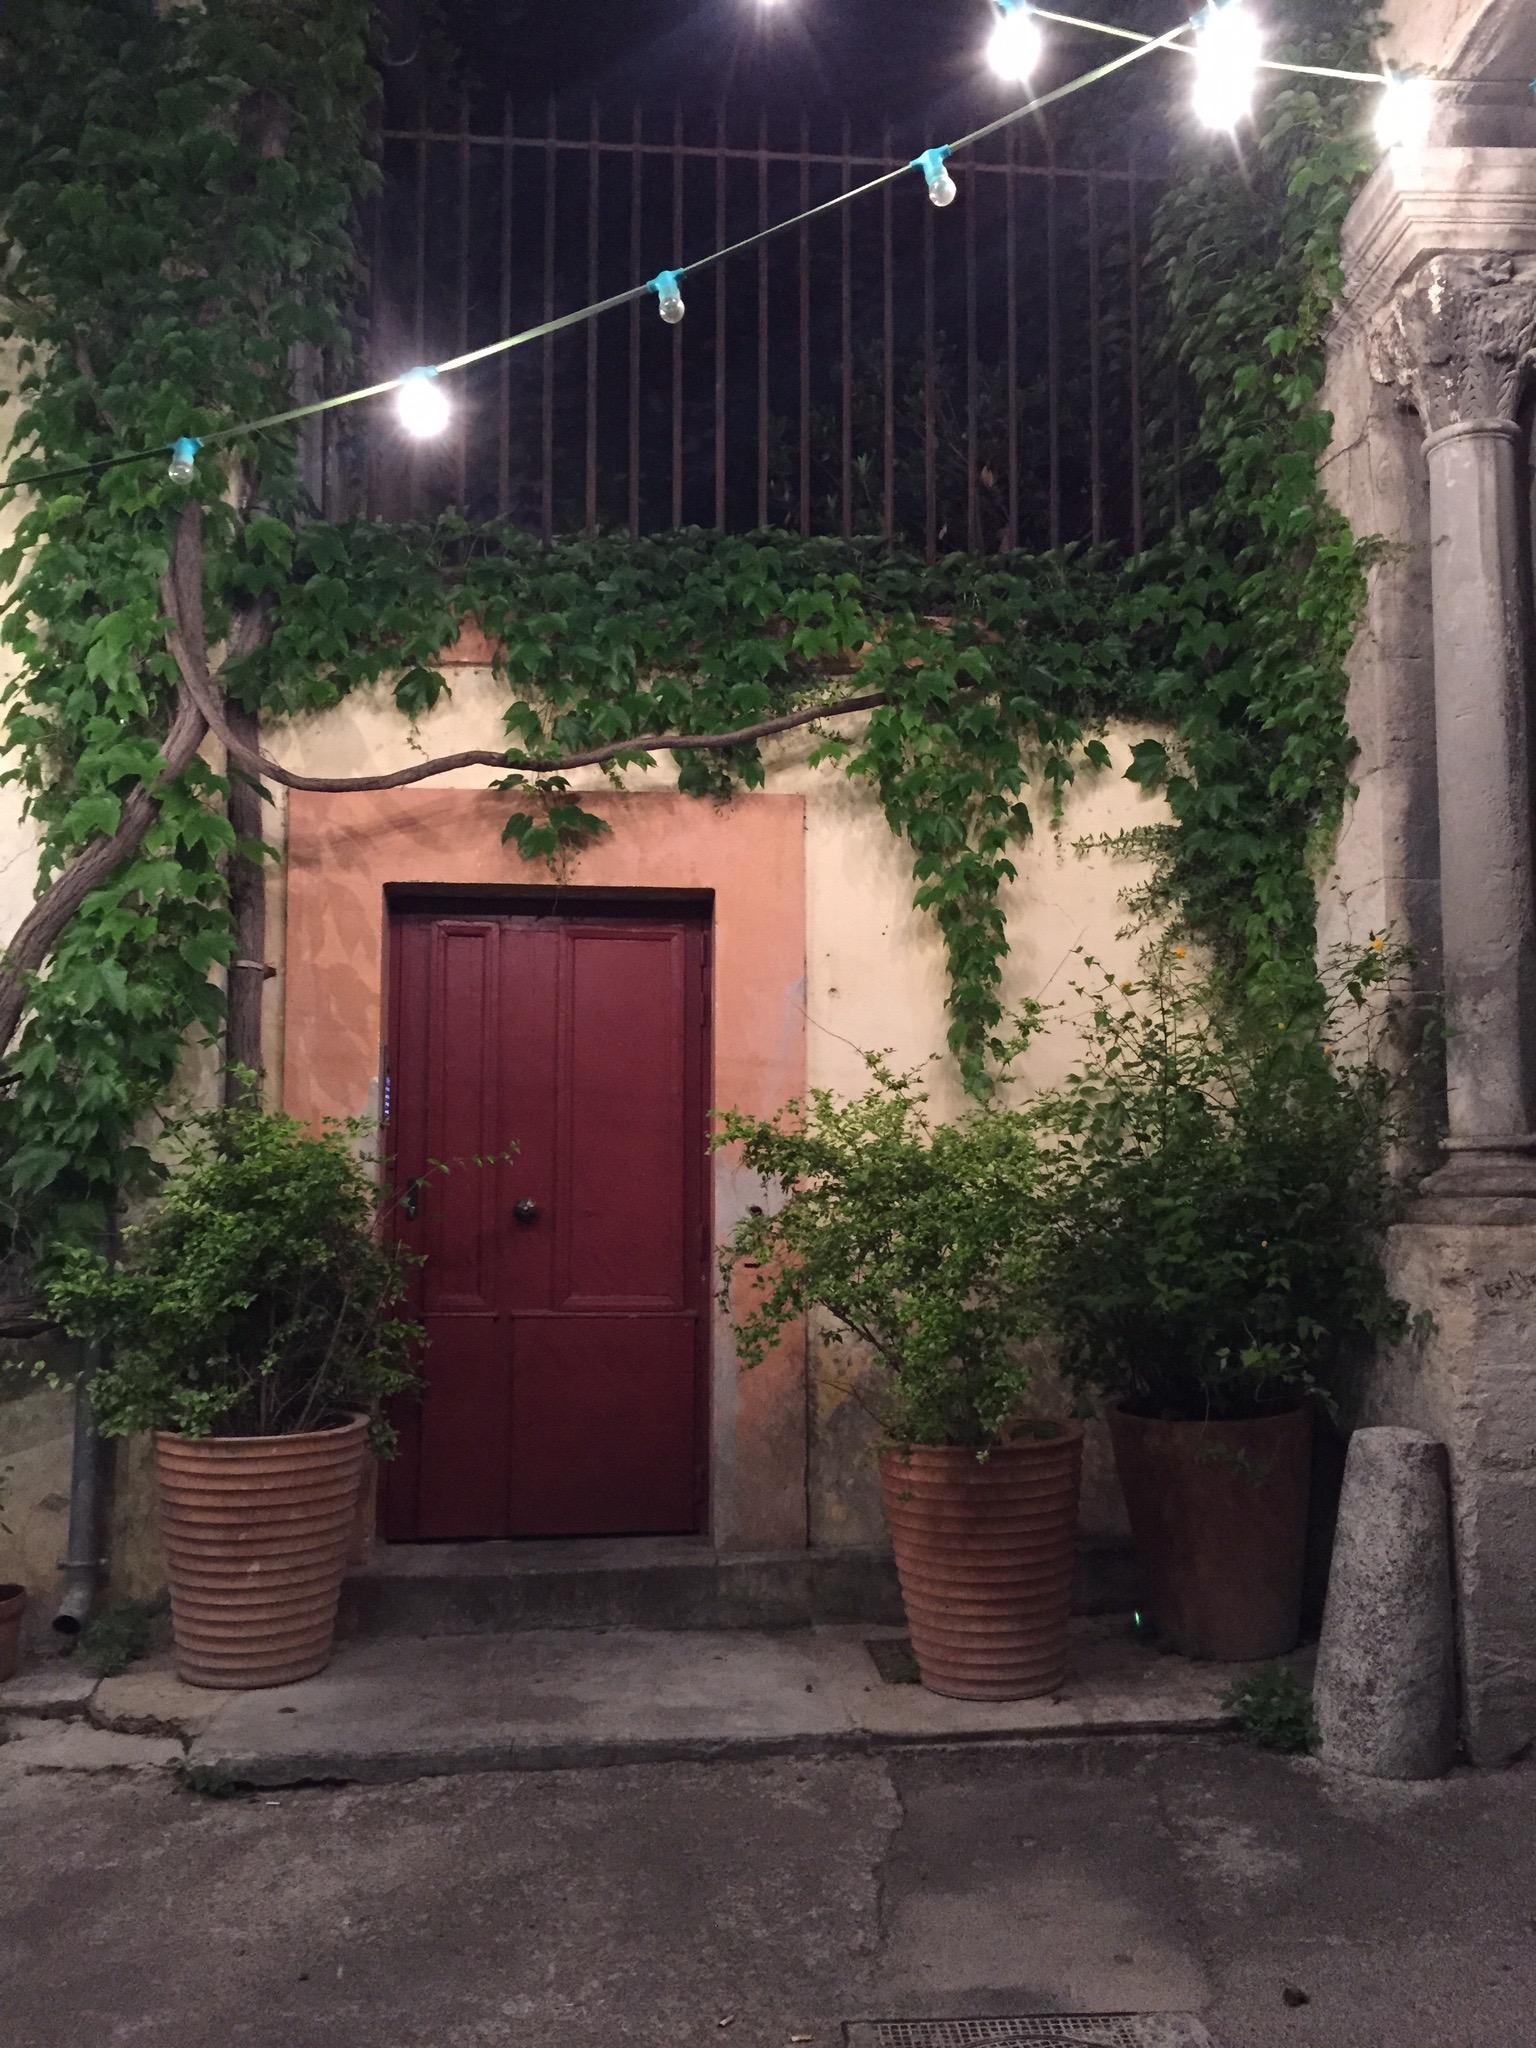 Hotel du Cloitre patio bar at night